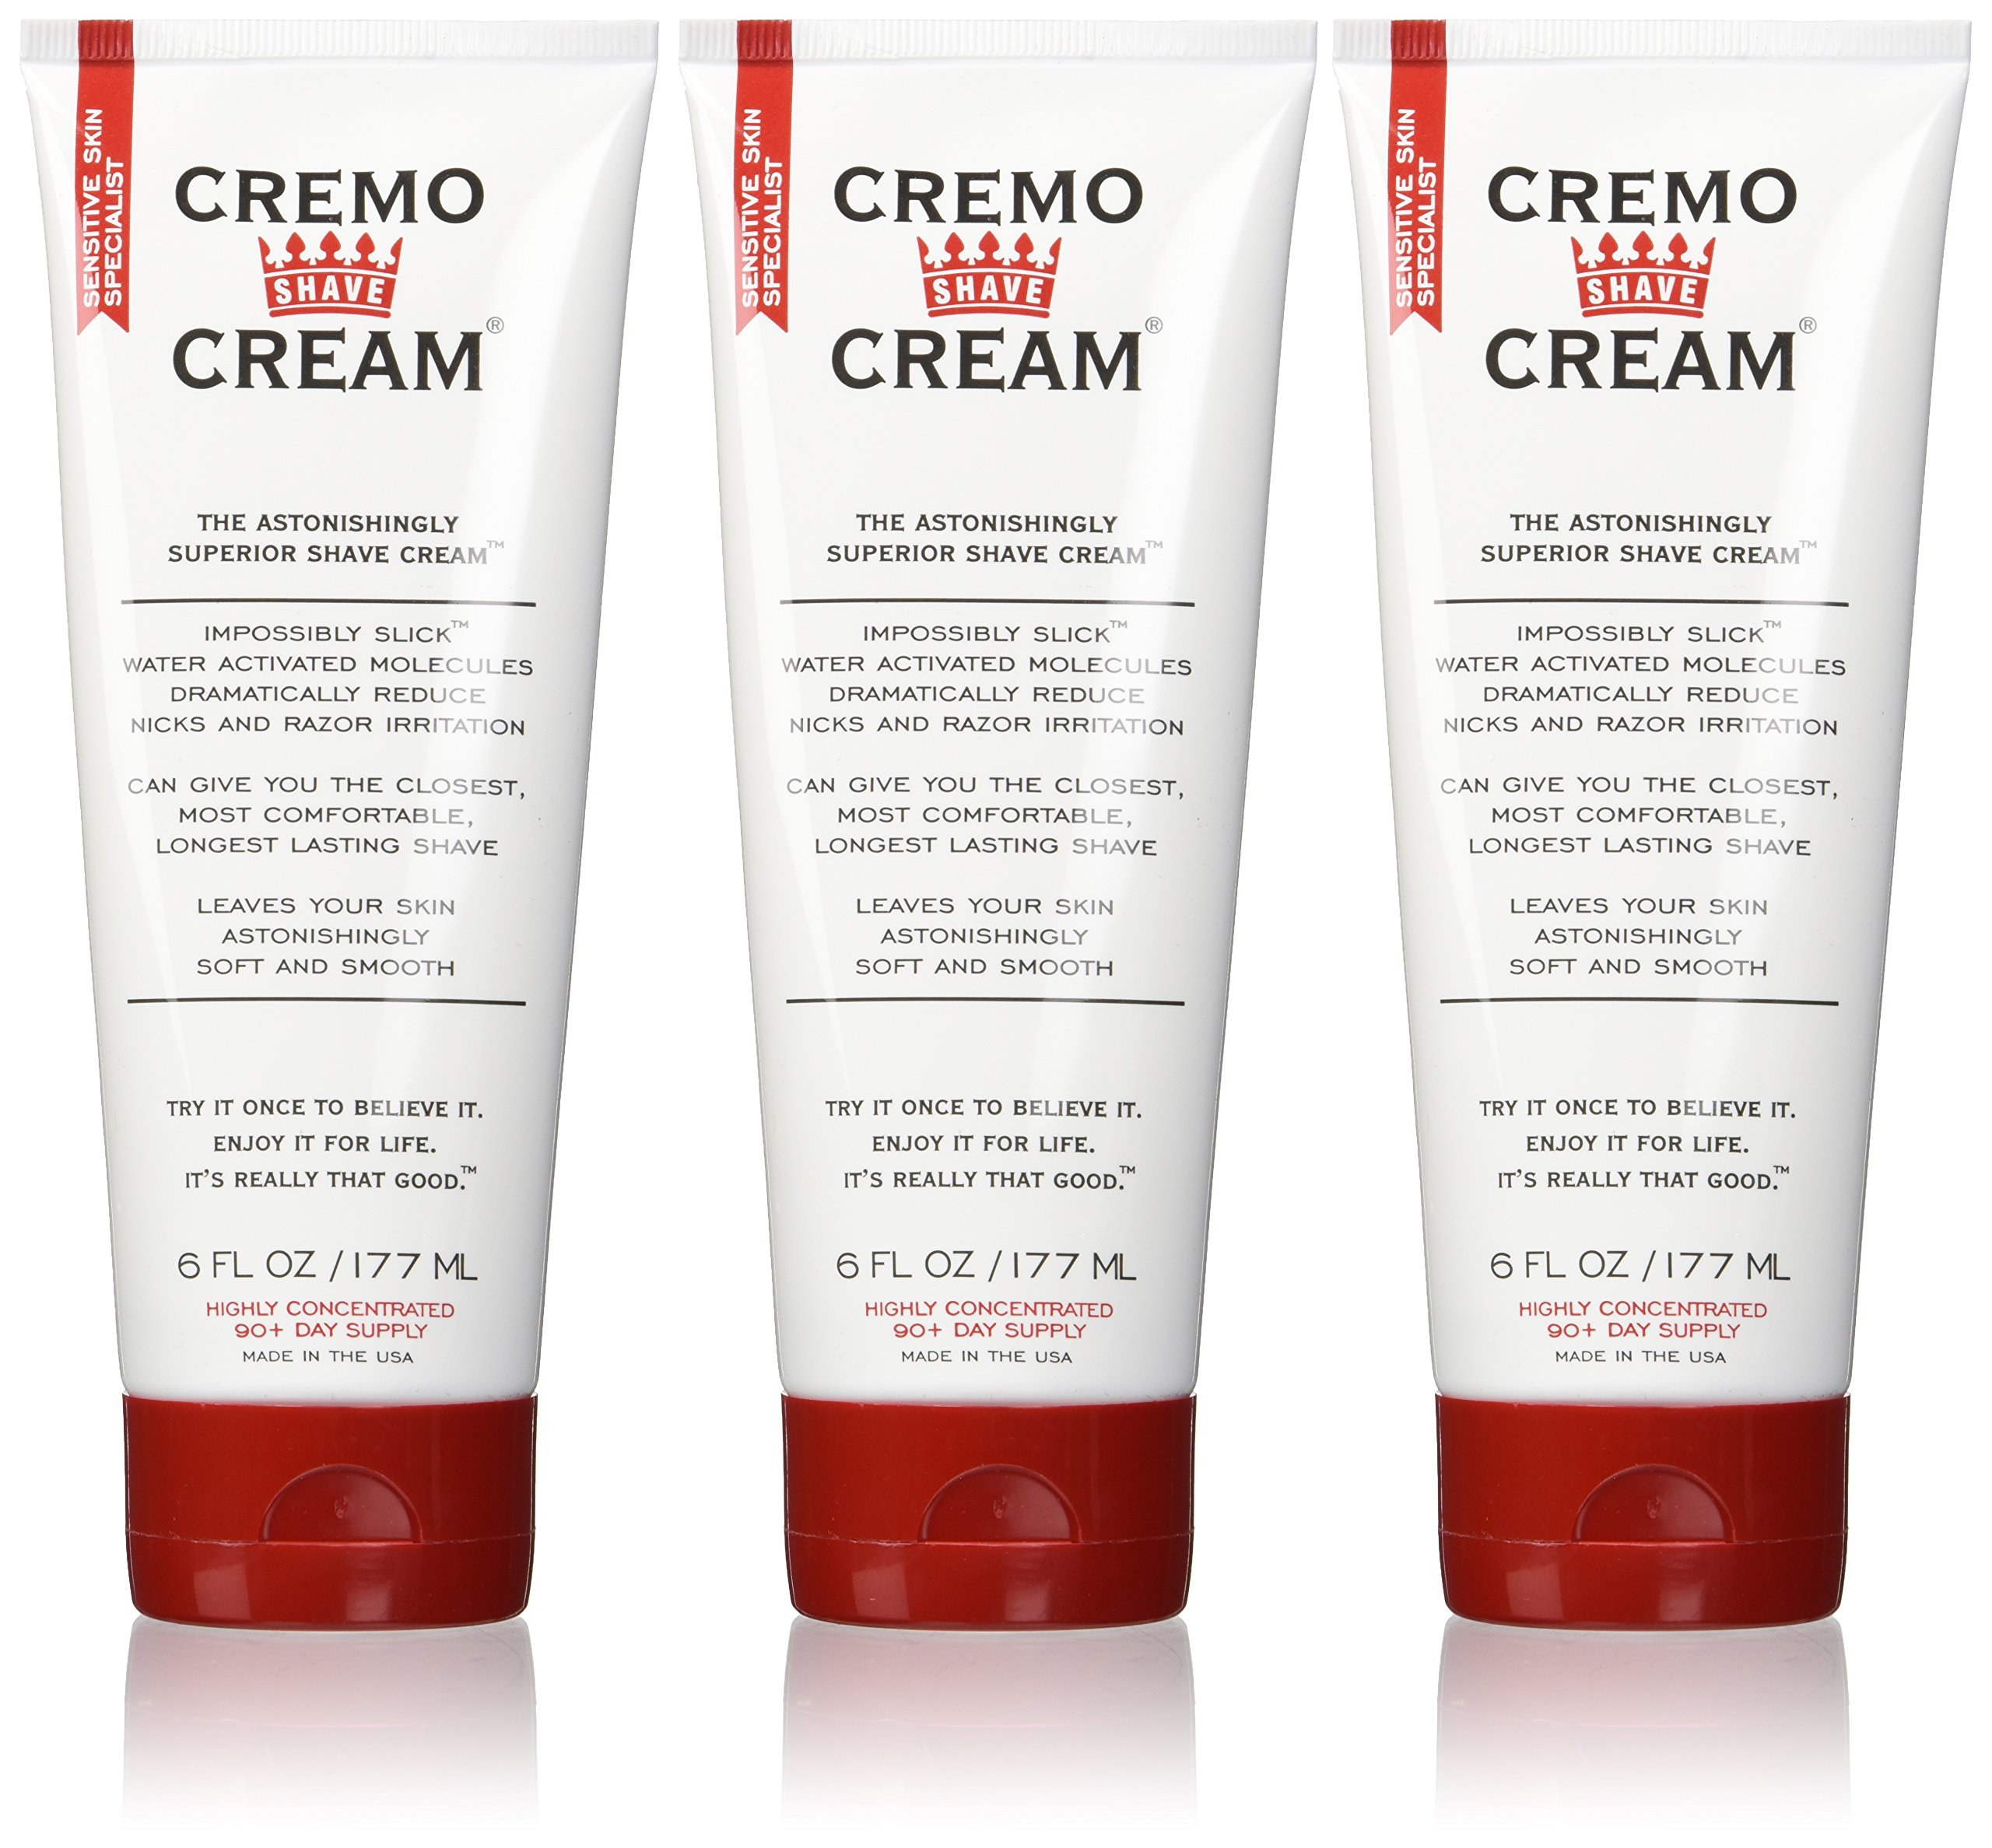 Cremo Original Shave Cream, Astonishingly Superior Shaving Cream for Men, 6 Fluid Ounce (3 Pack)